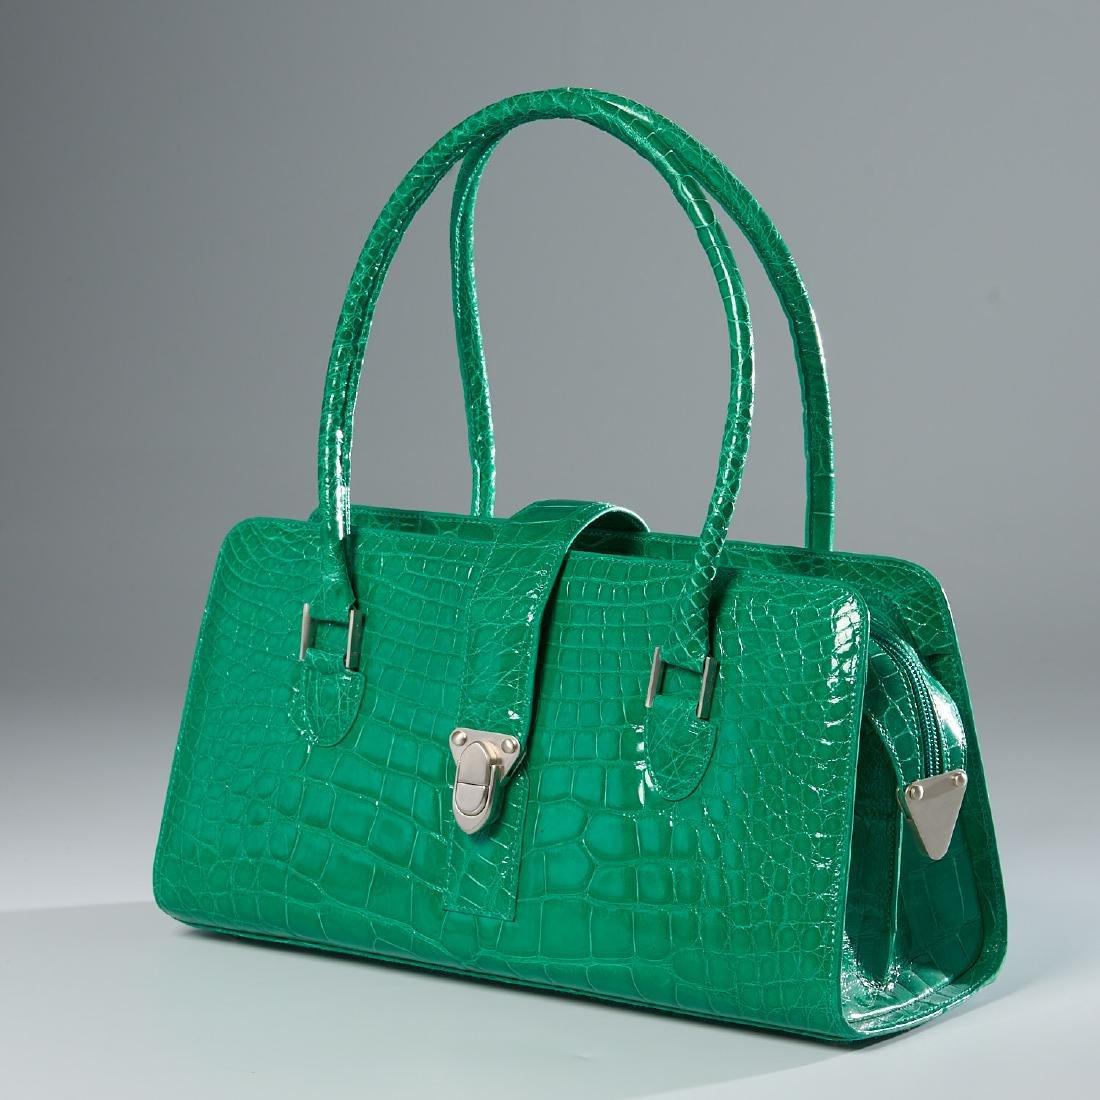 Manolo Blahnik kelly green crocodile handbag